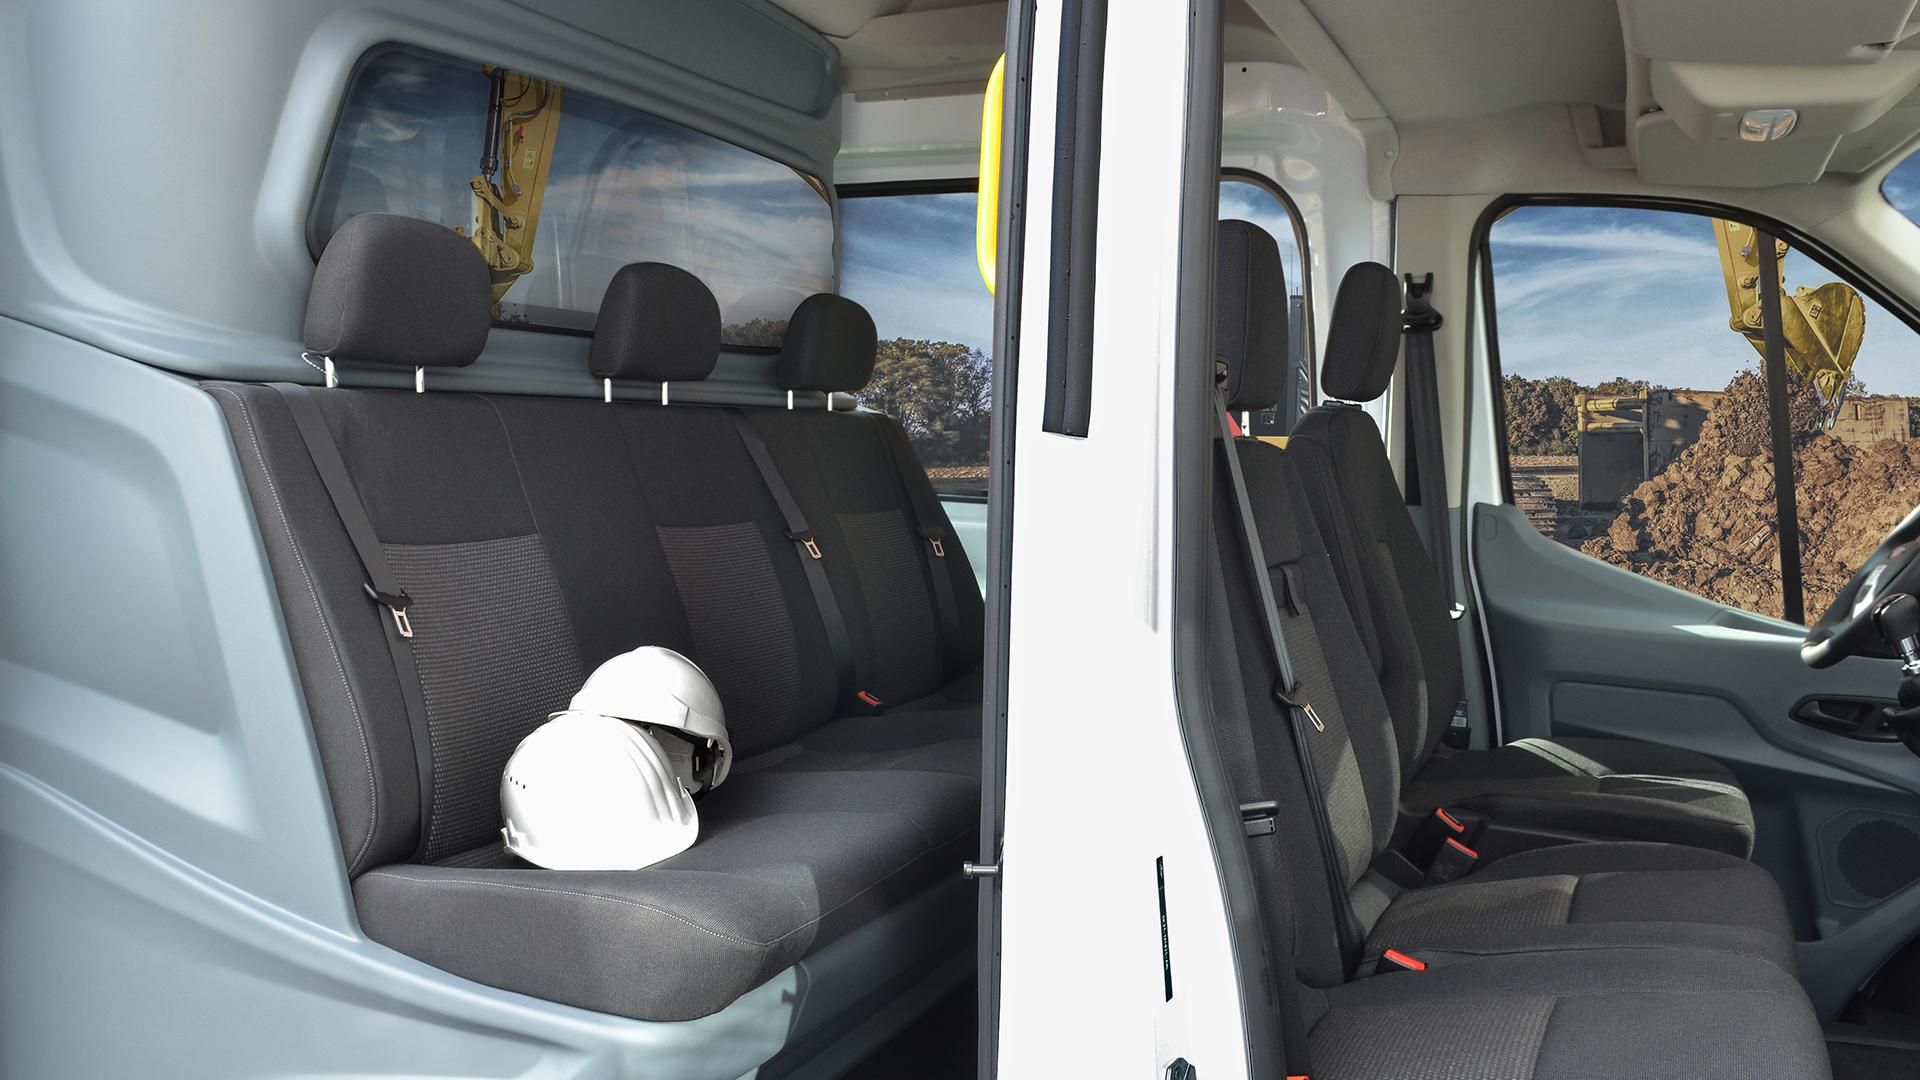 Ford Transit Crew Van conversion kit by Snoeks